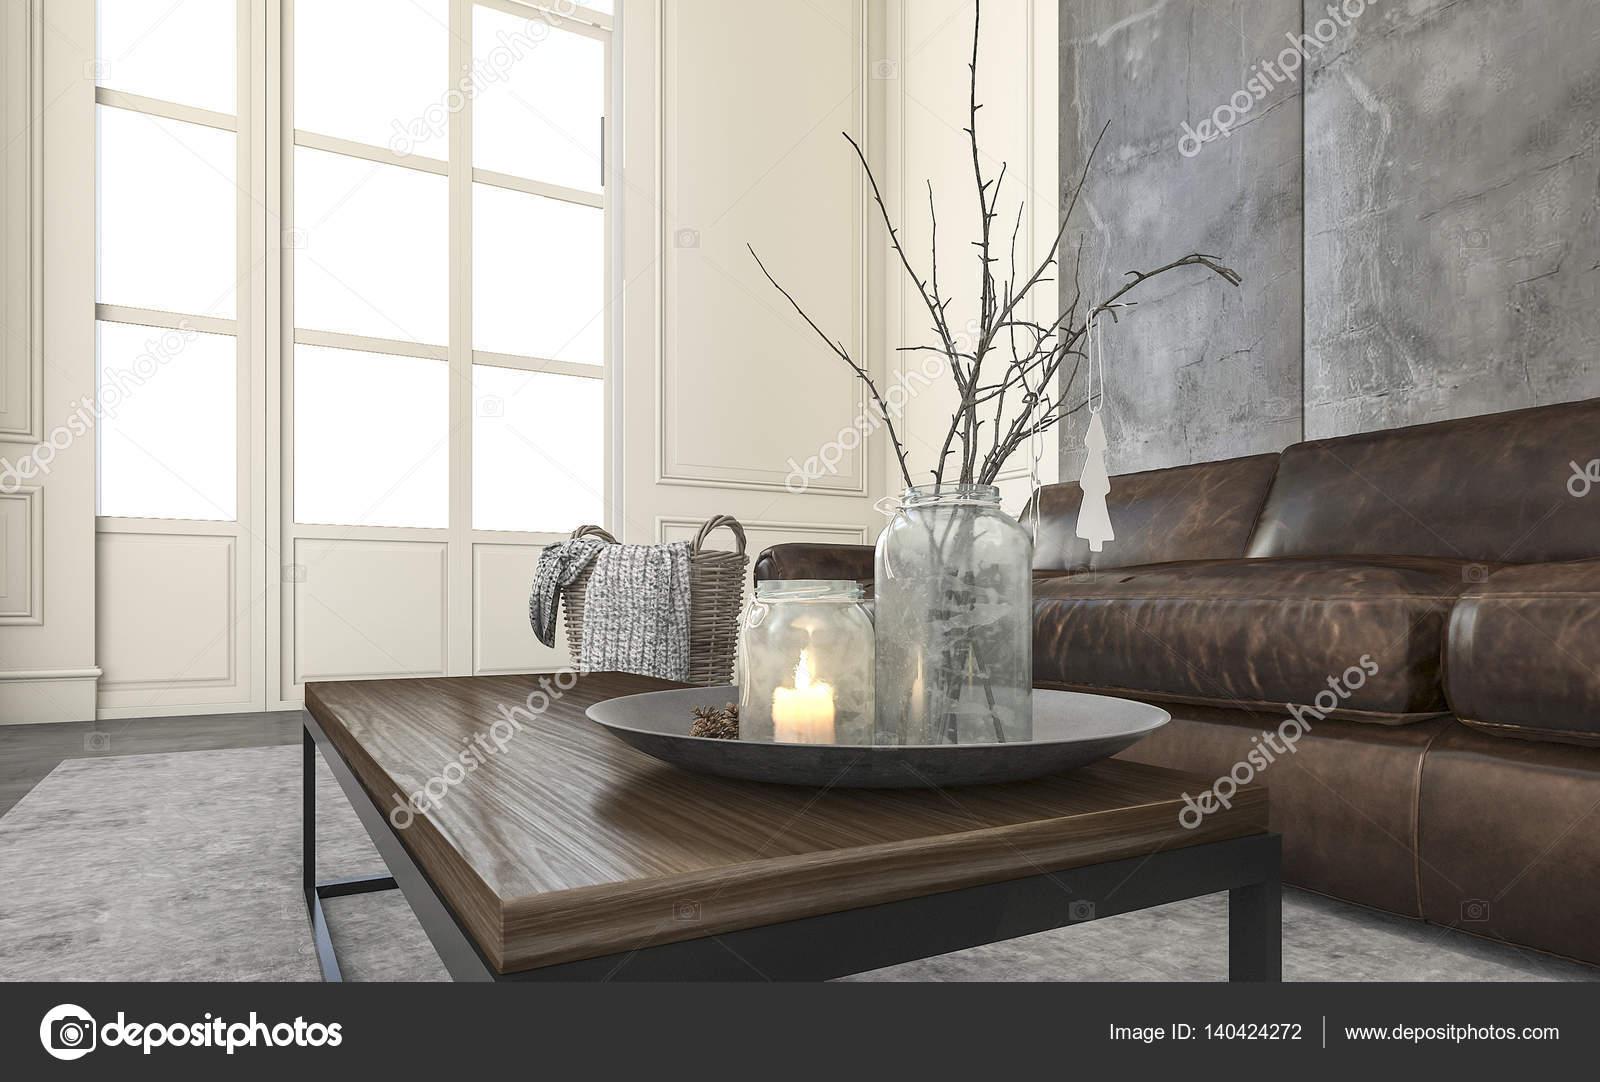 Leuke Accessoires Woonkamer : D rendering daglicht in woonkamer met leuke decoratie en